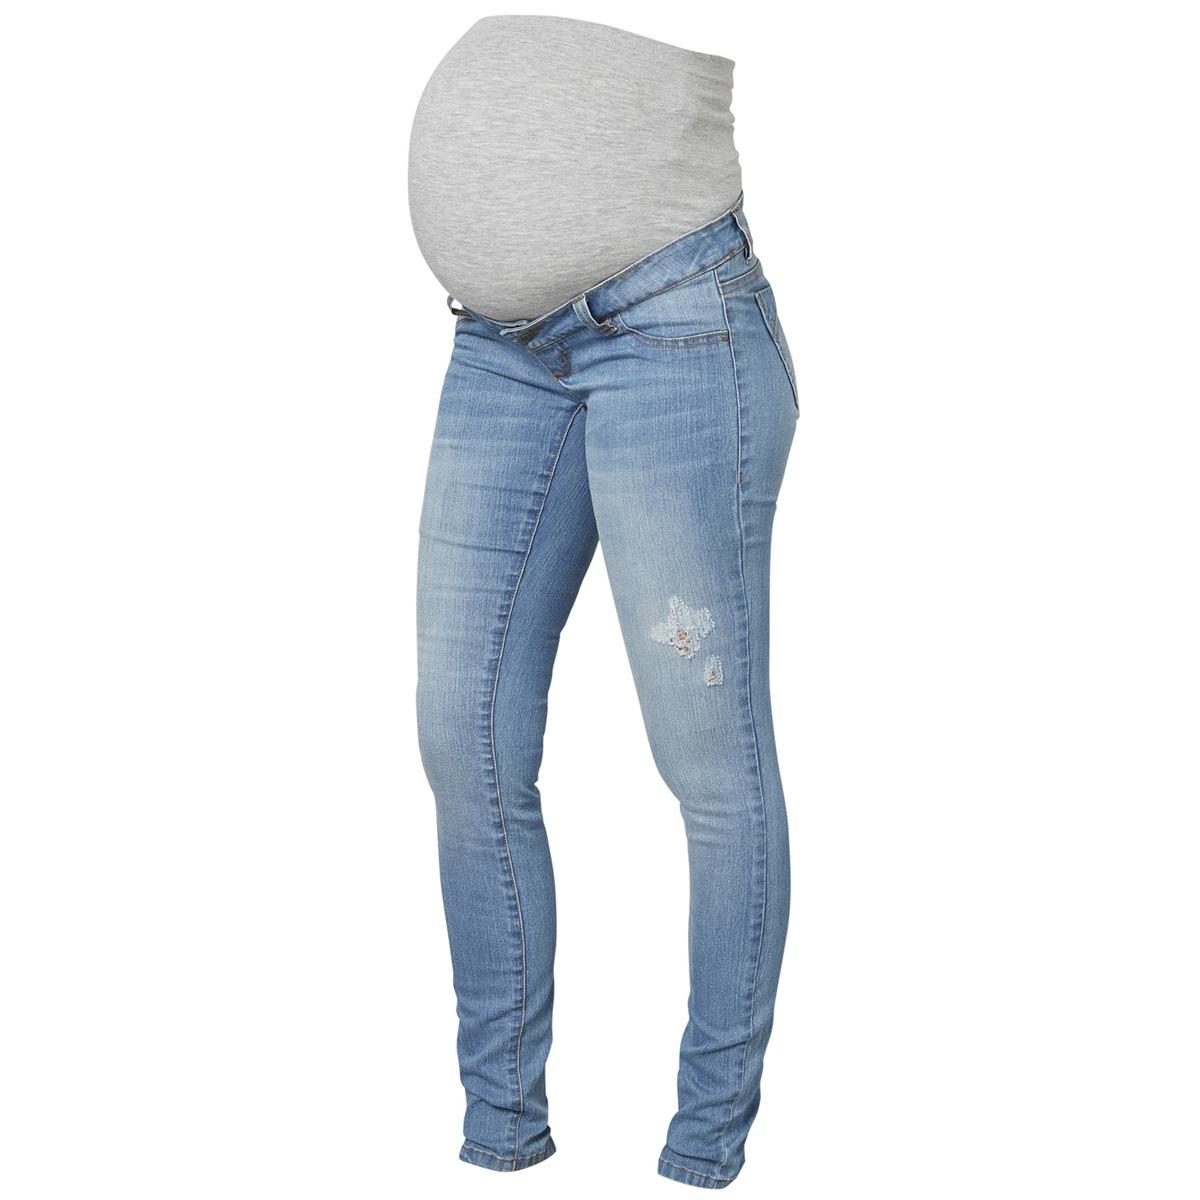 mljulia slim light blue washed jean 20009641 mama-licious positie broek light blue denim